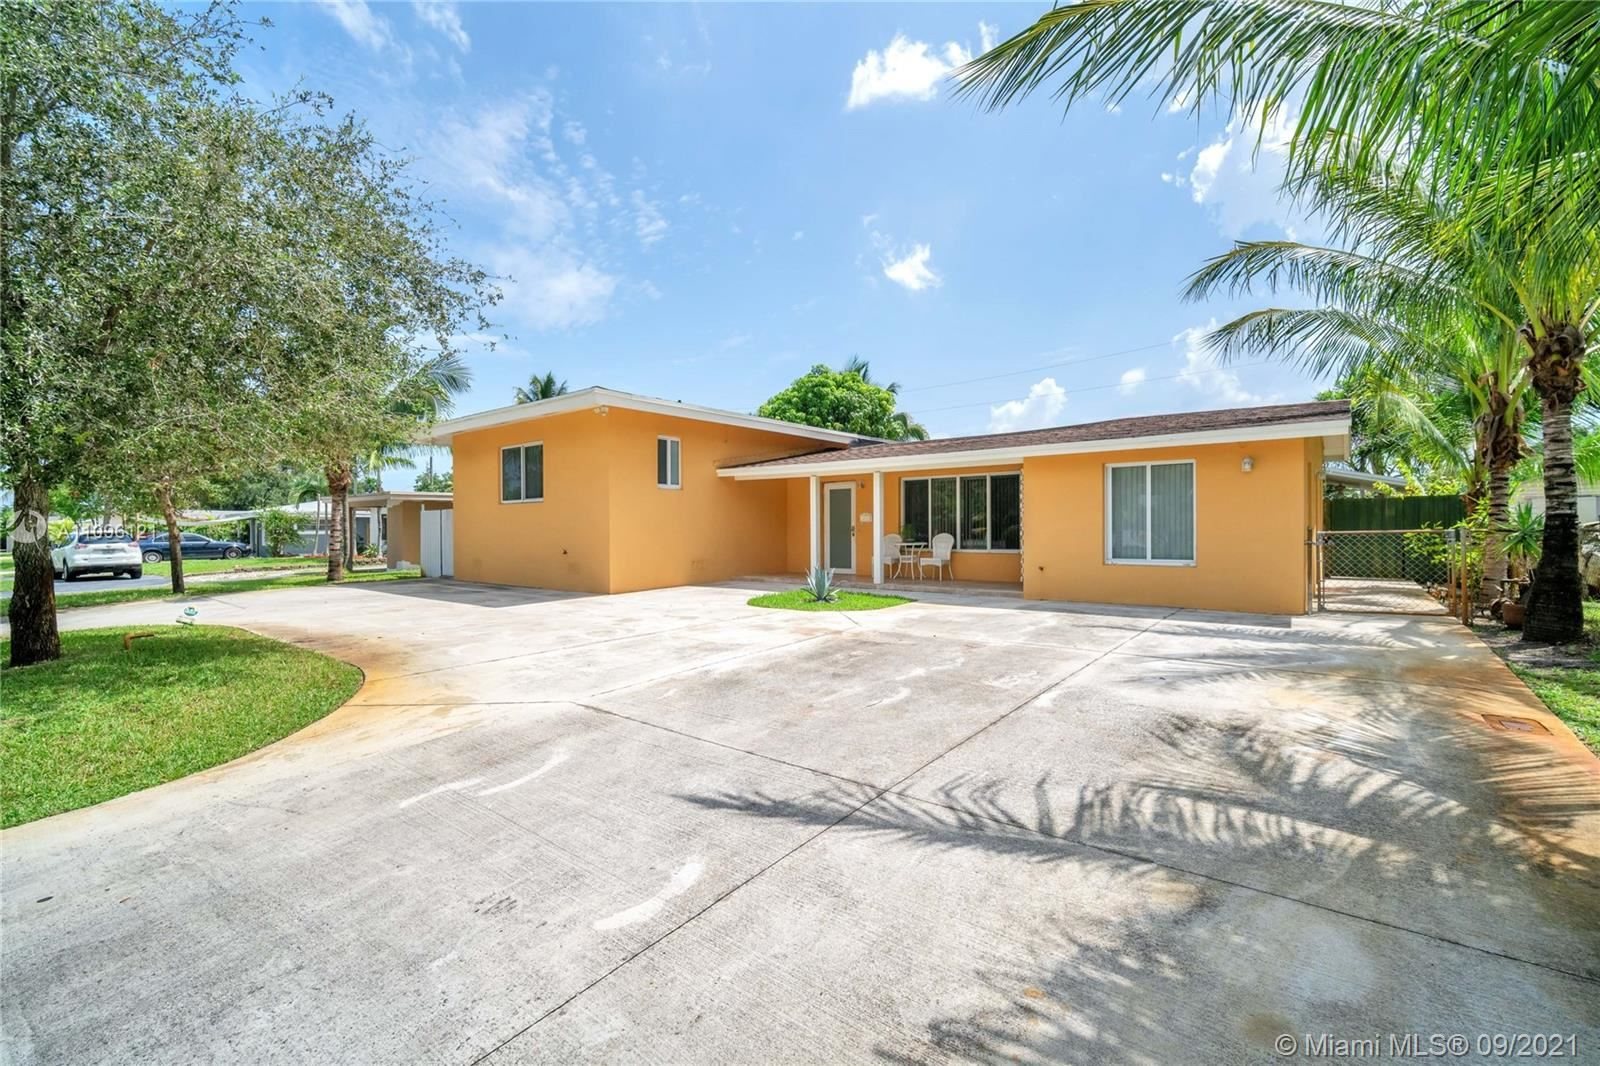 1136 Alabama Ave, Fort Lauderdale, FL 33312 - #: A11096121